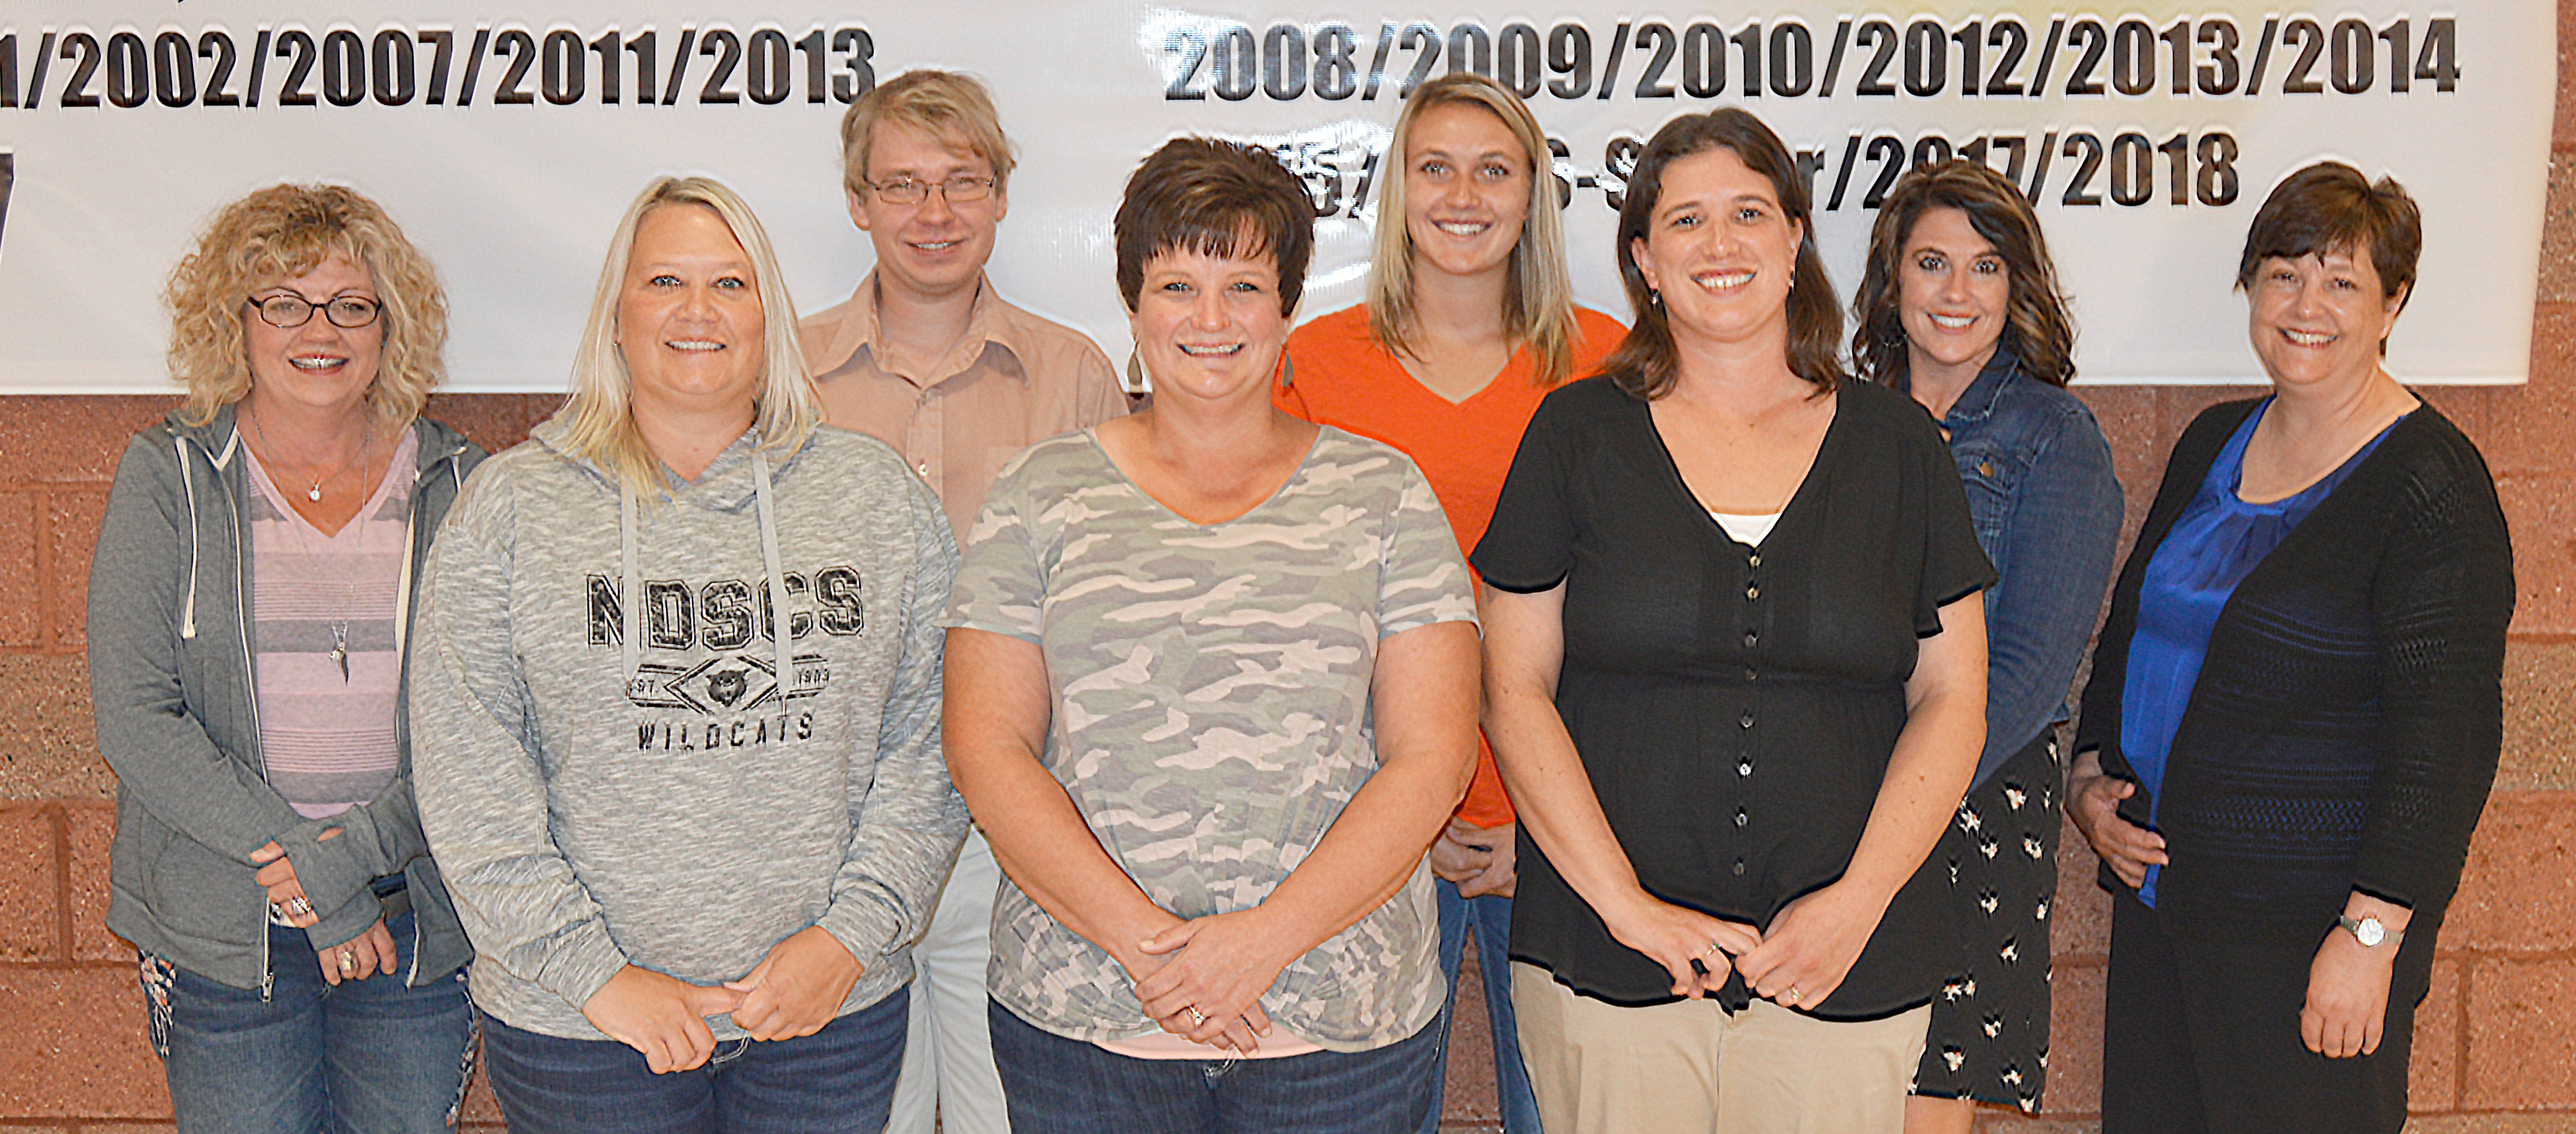 New Staff At BL and Und Schools